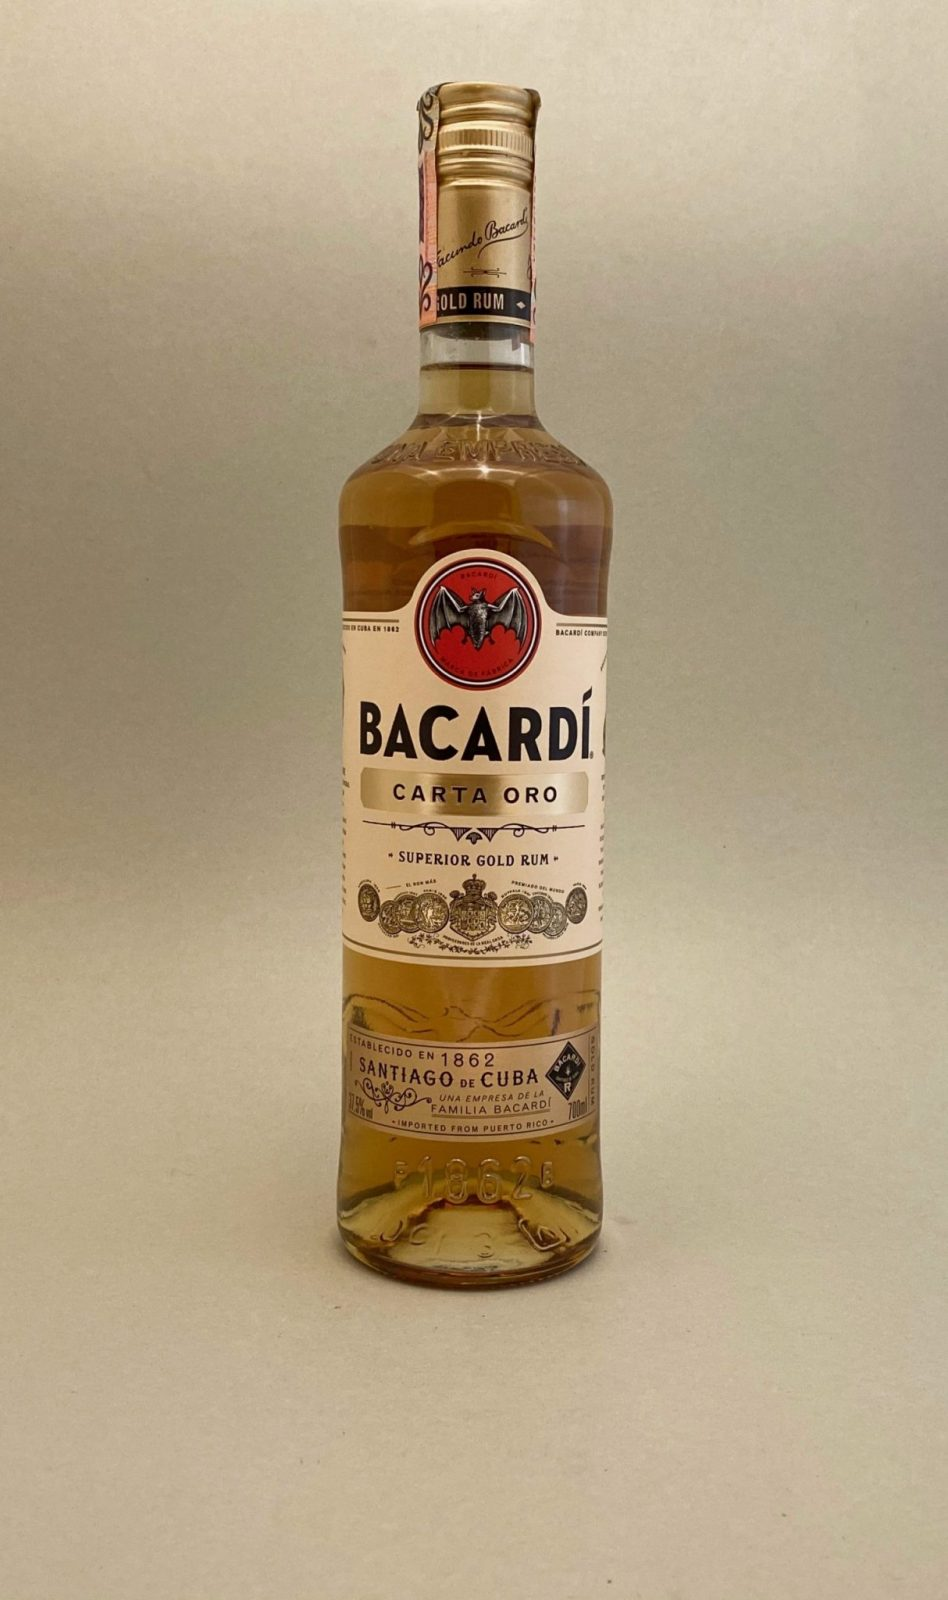 Bacardi Carta Oro 37,5%, Bottleshop Sunny wines slnecnice mesto, petrzalka, rum, rumy, rozvoz alkoholu, eshop